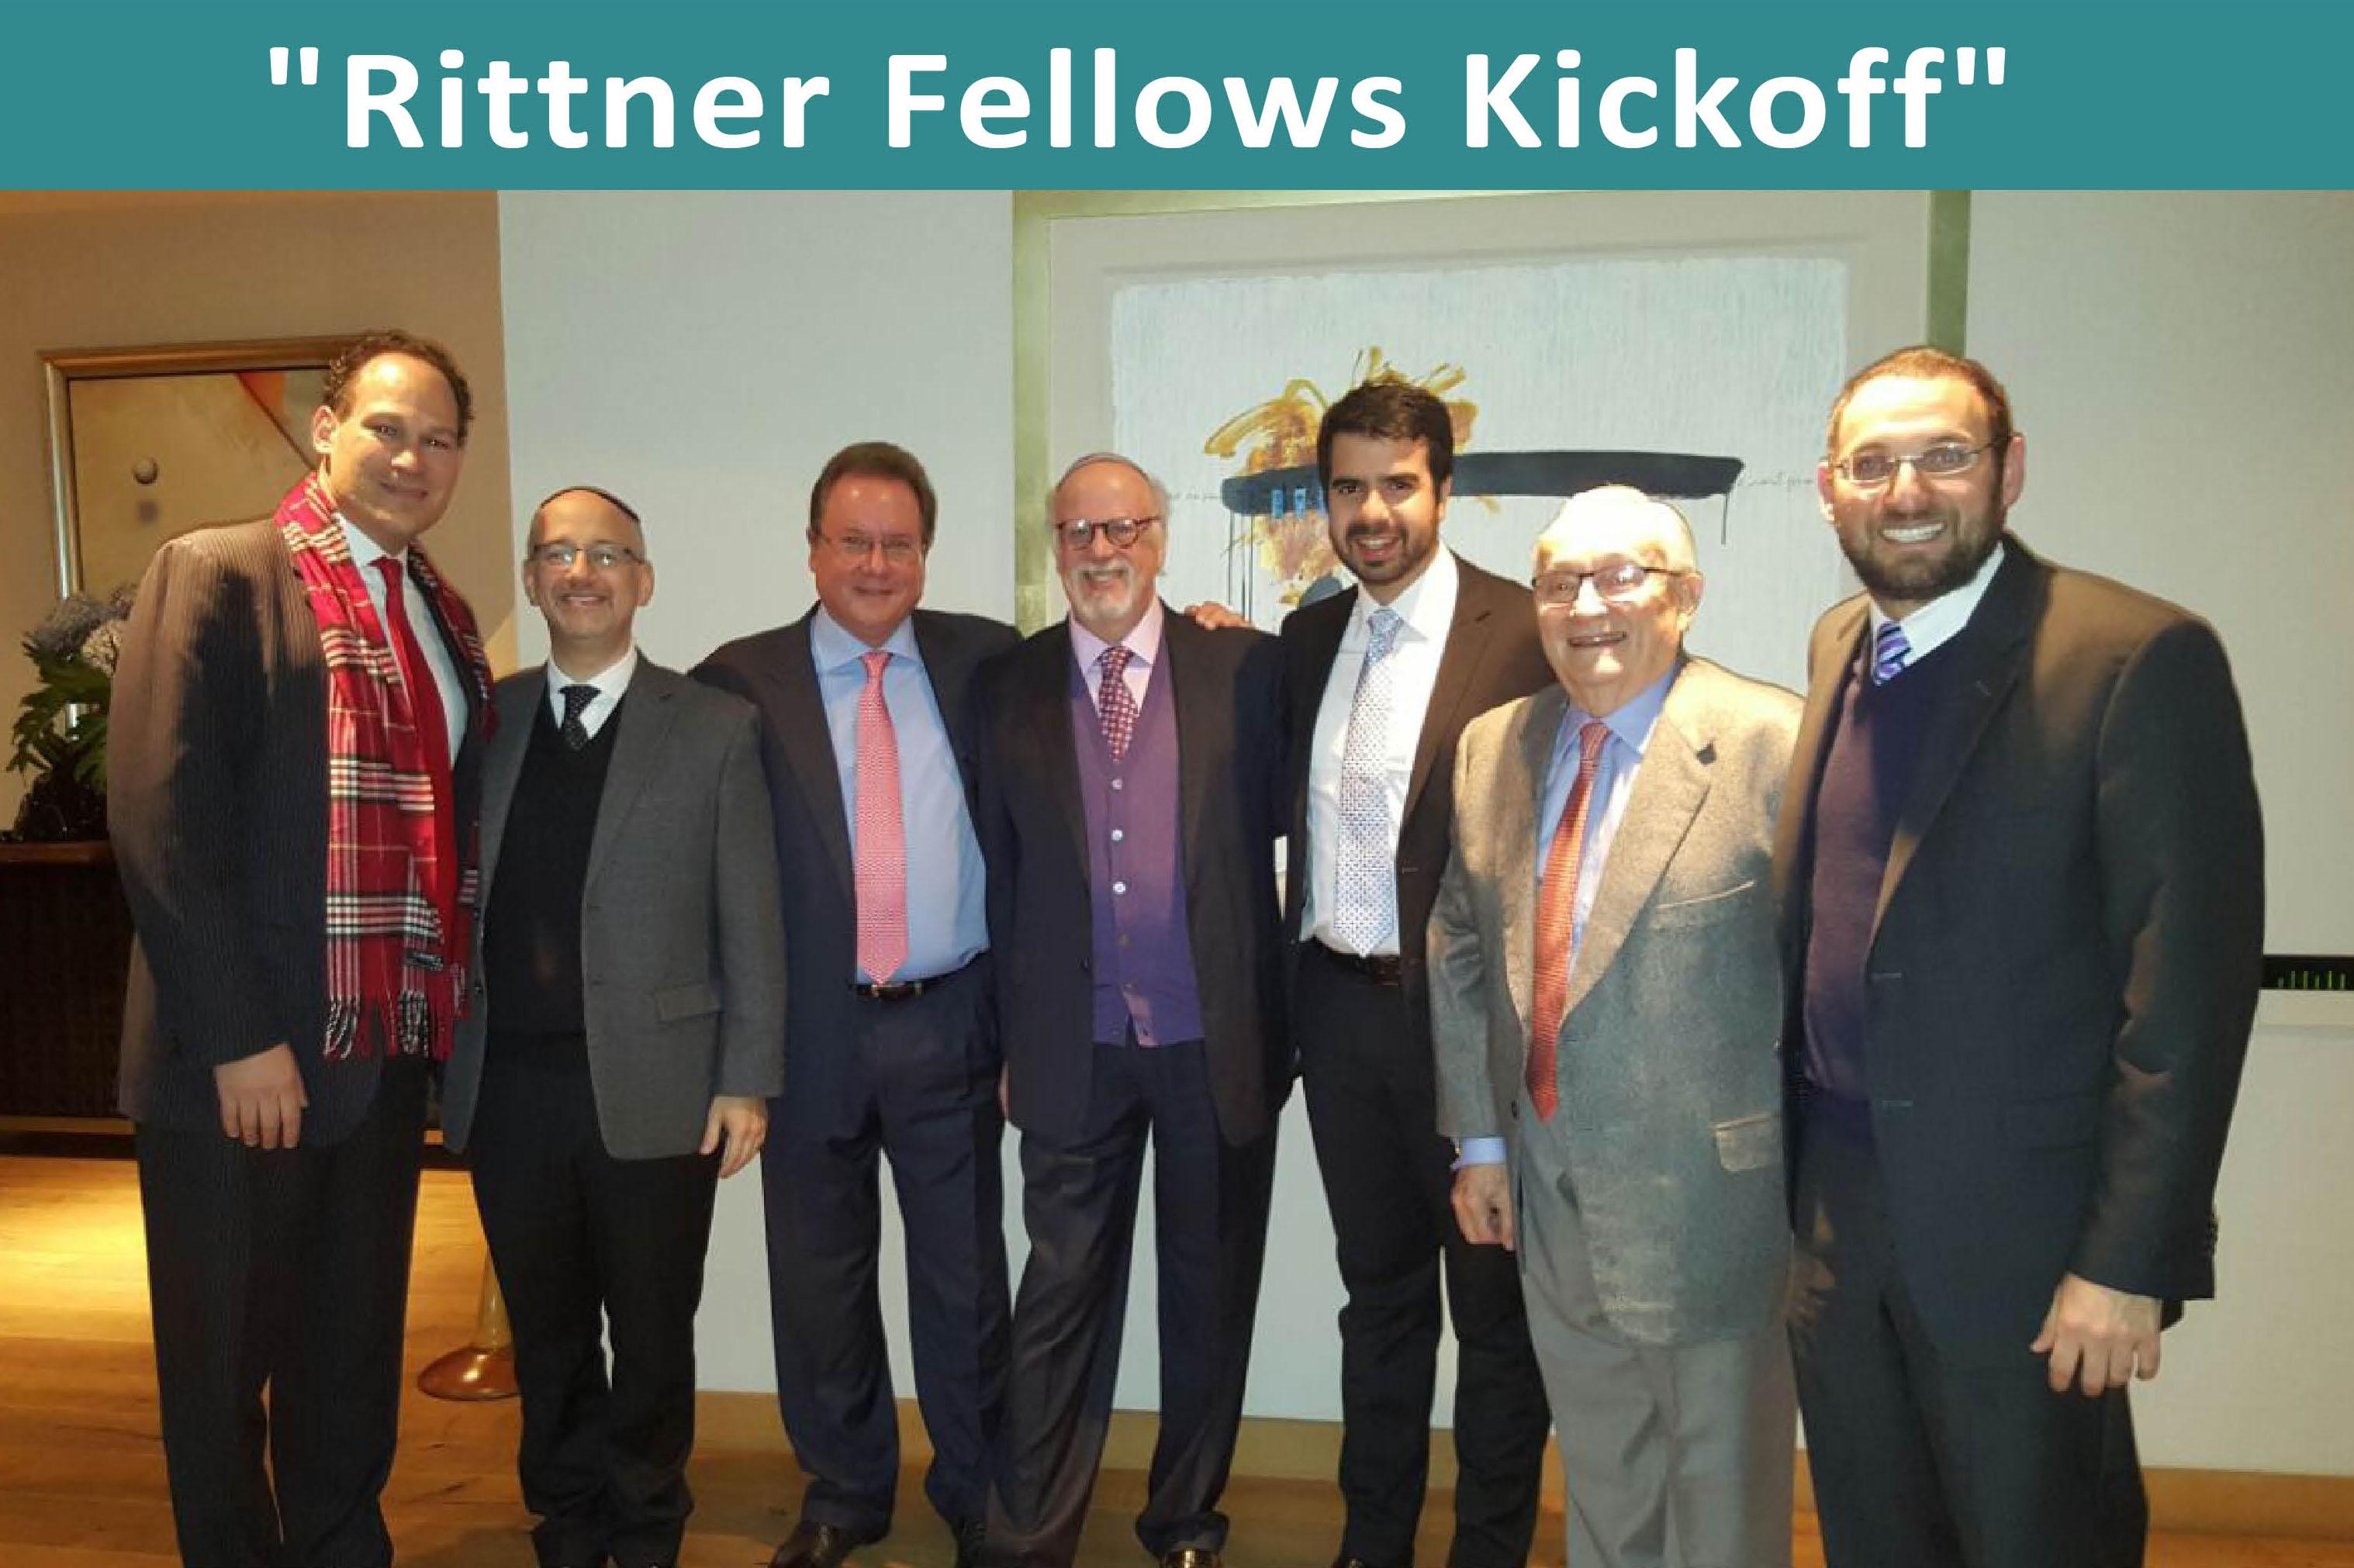 Rittner-Fellows-Kickoff